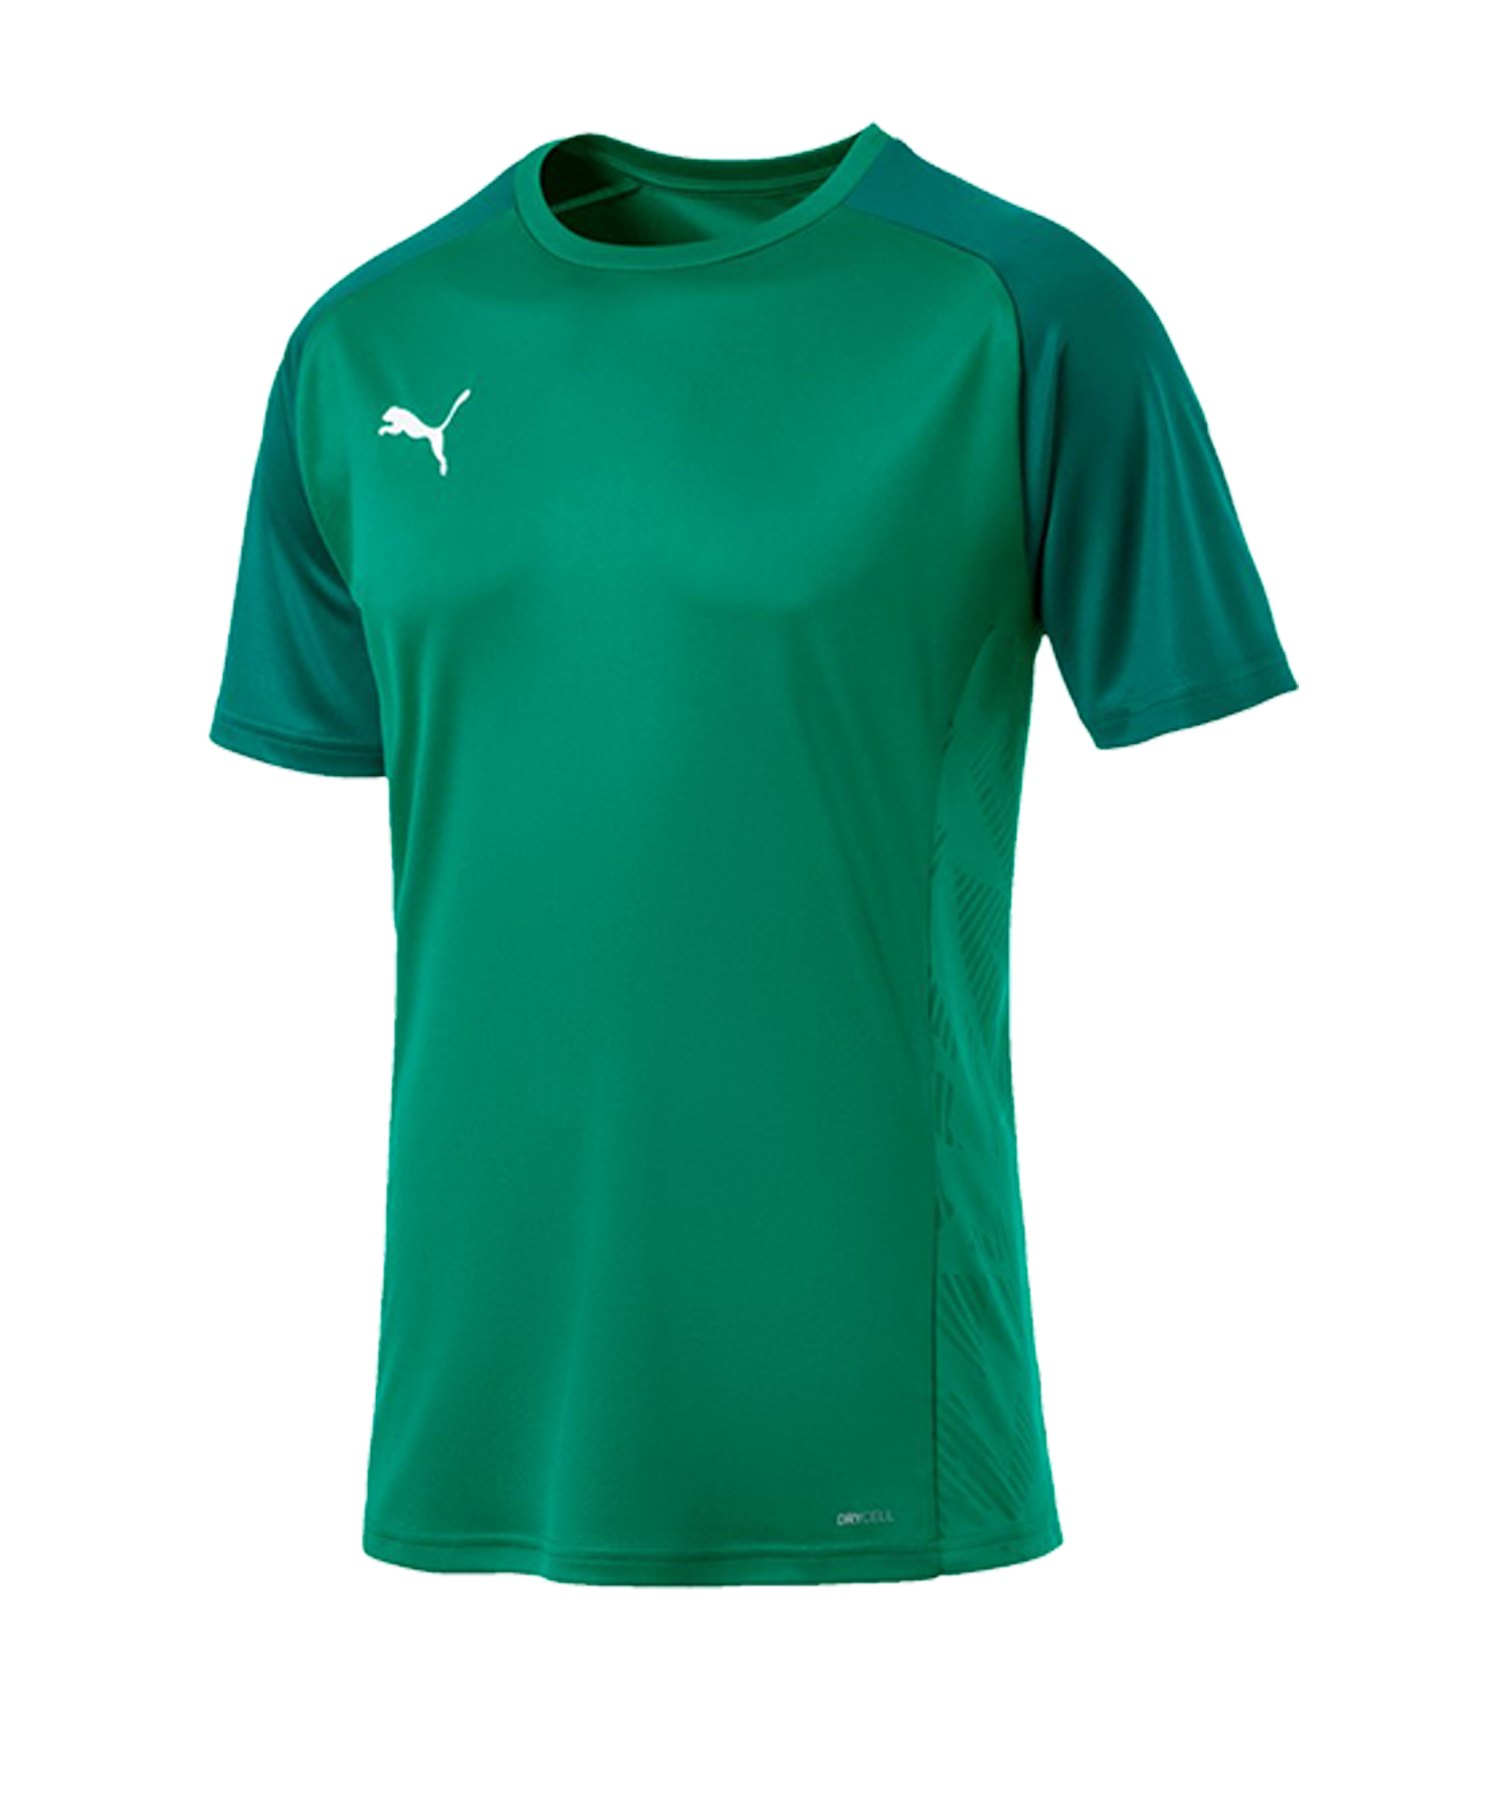 PUMA CUP Sideline Core T-Shirt Grün F05 - gruen